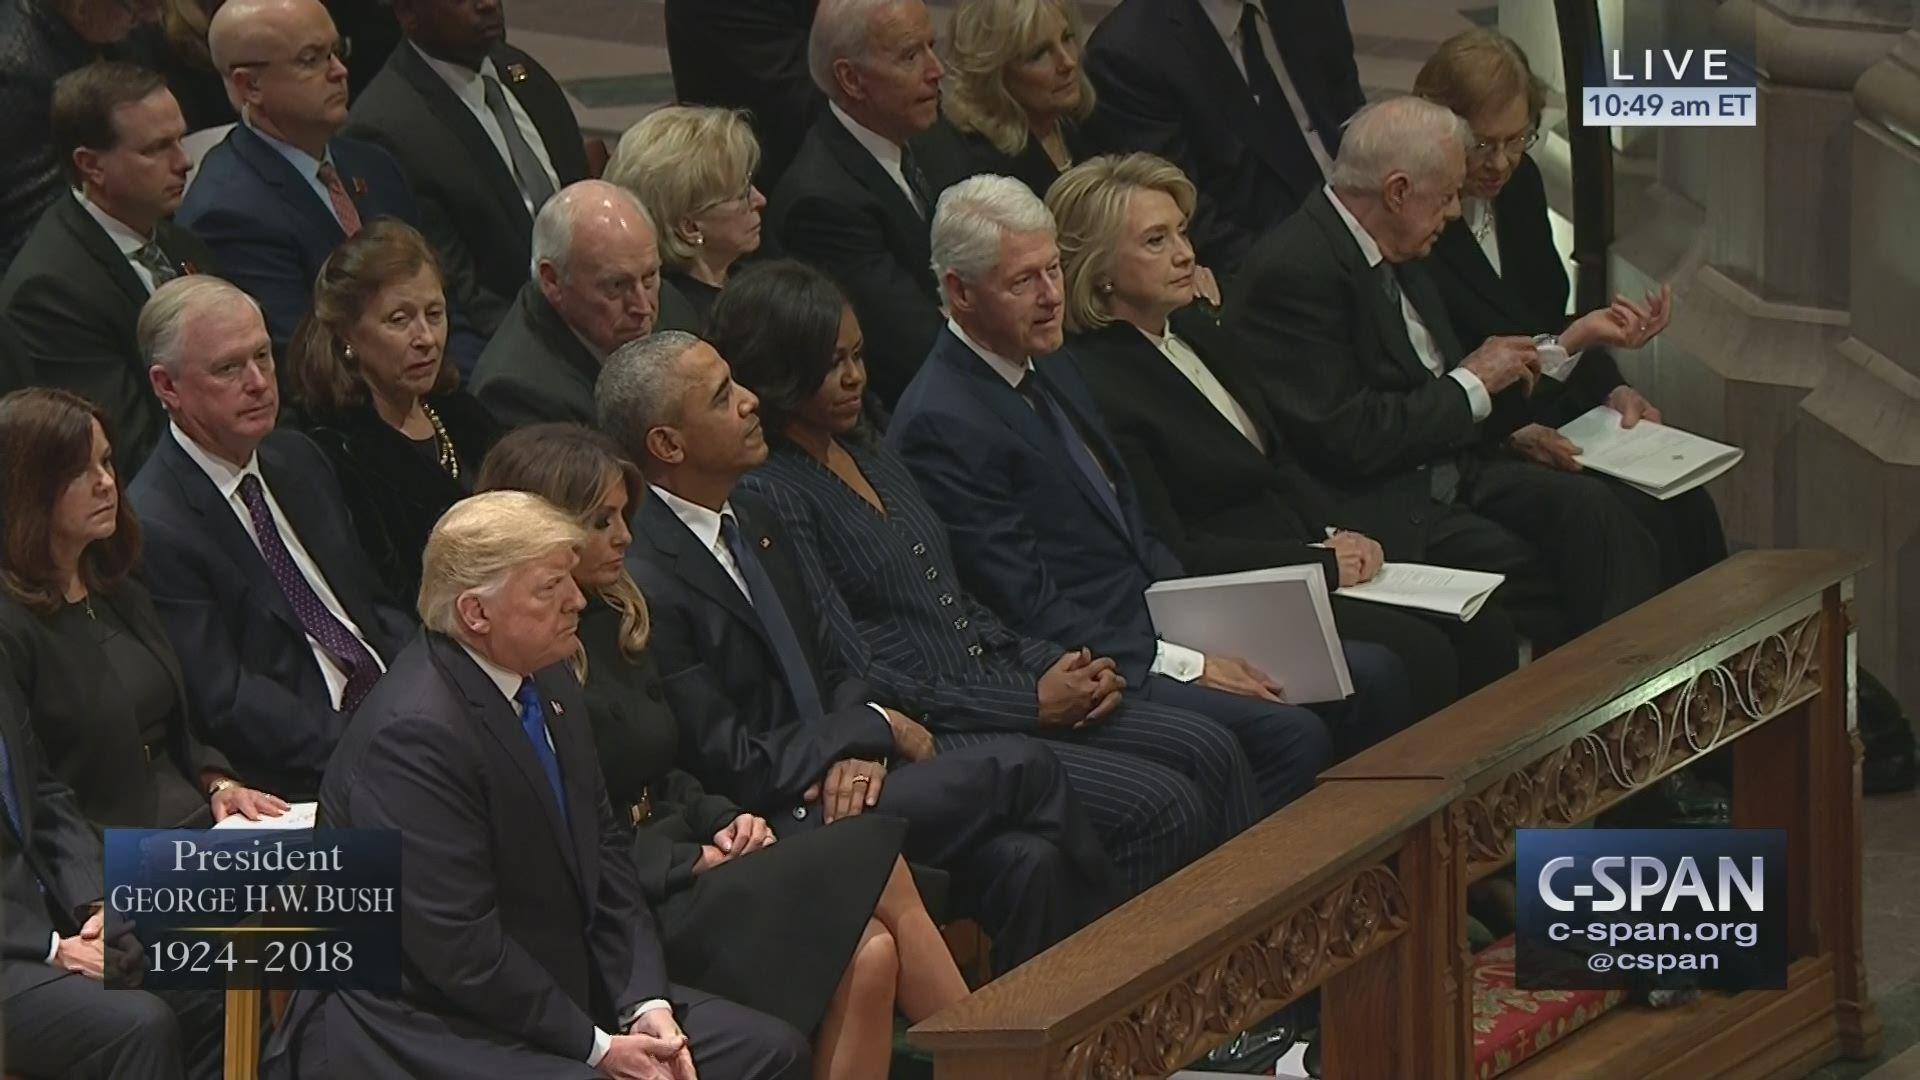 State Funeral for President George H.W. Bush – LIVE on C-SPAN https://t.co/QjhOF3Sxvc #Bush41 https://t.co/rohZslnyqI